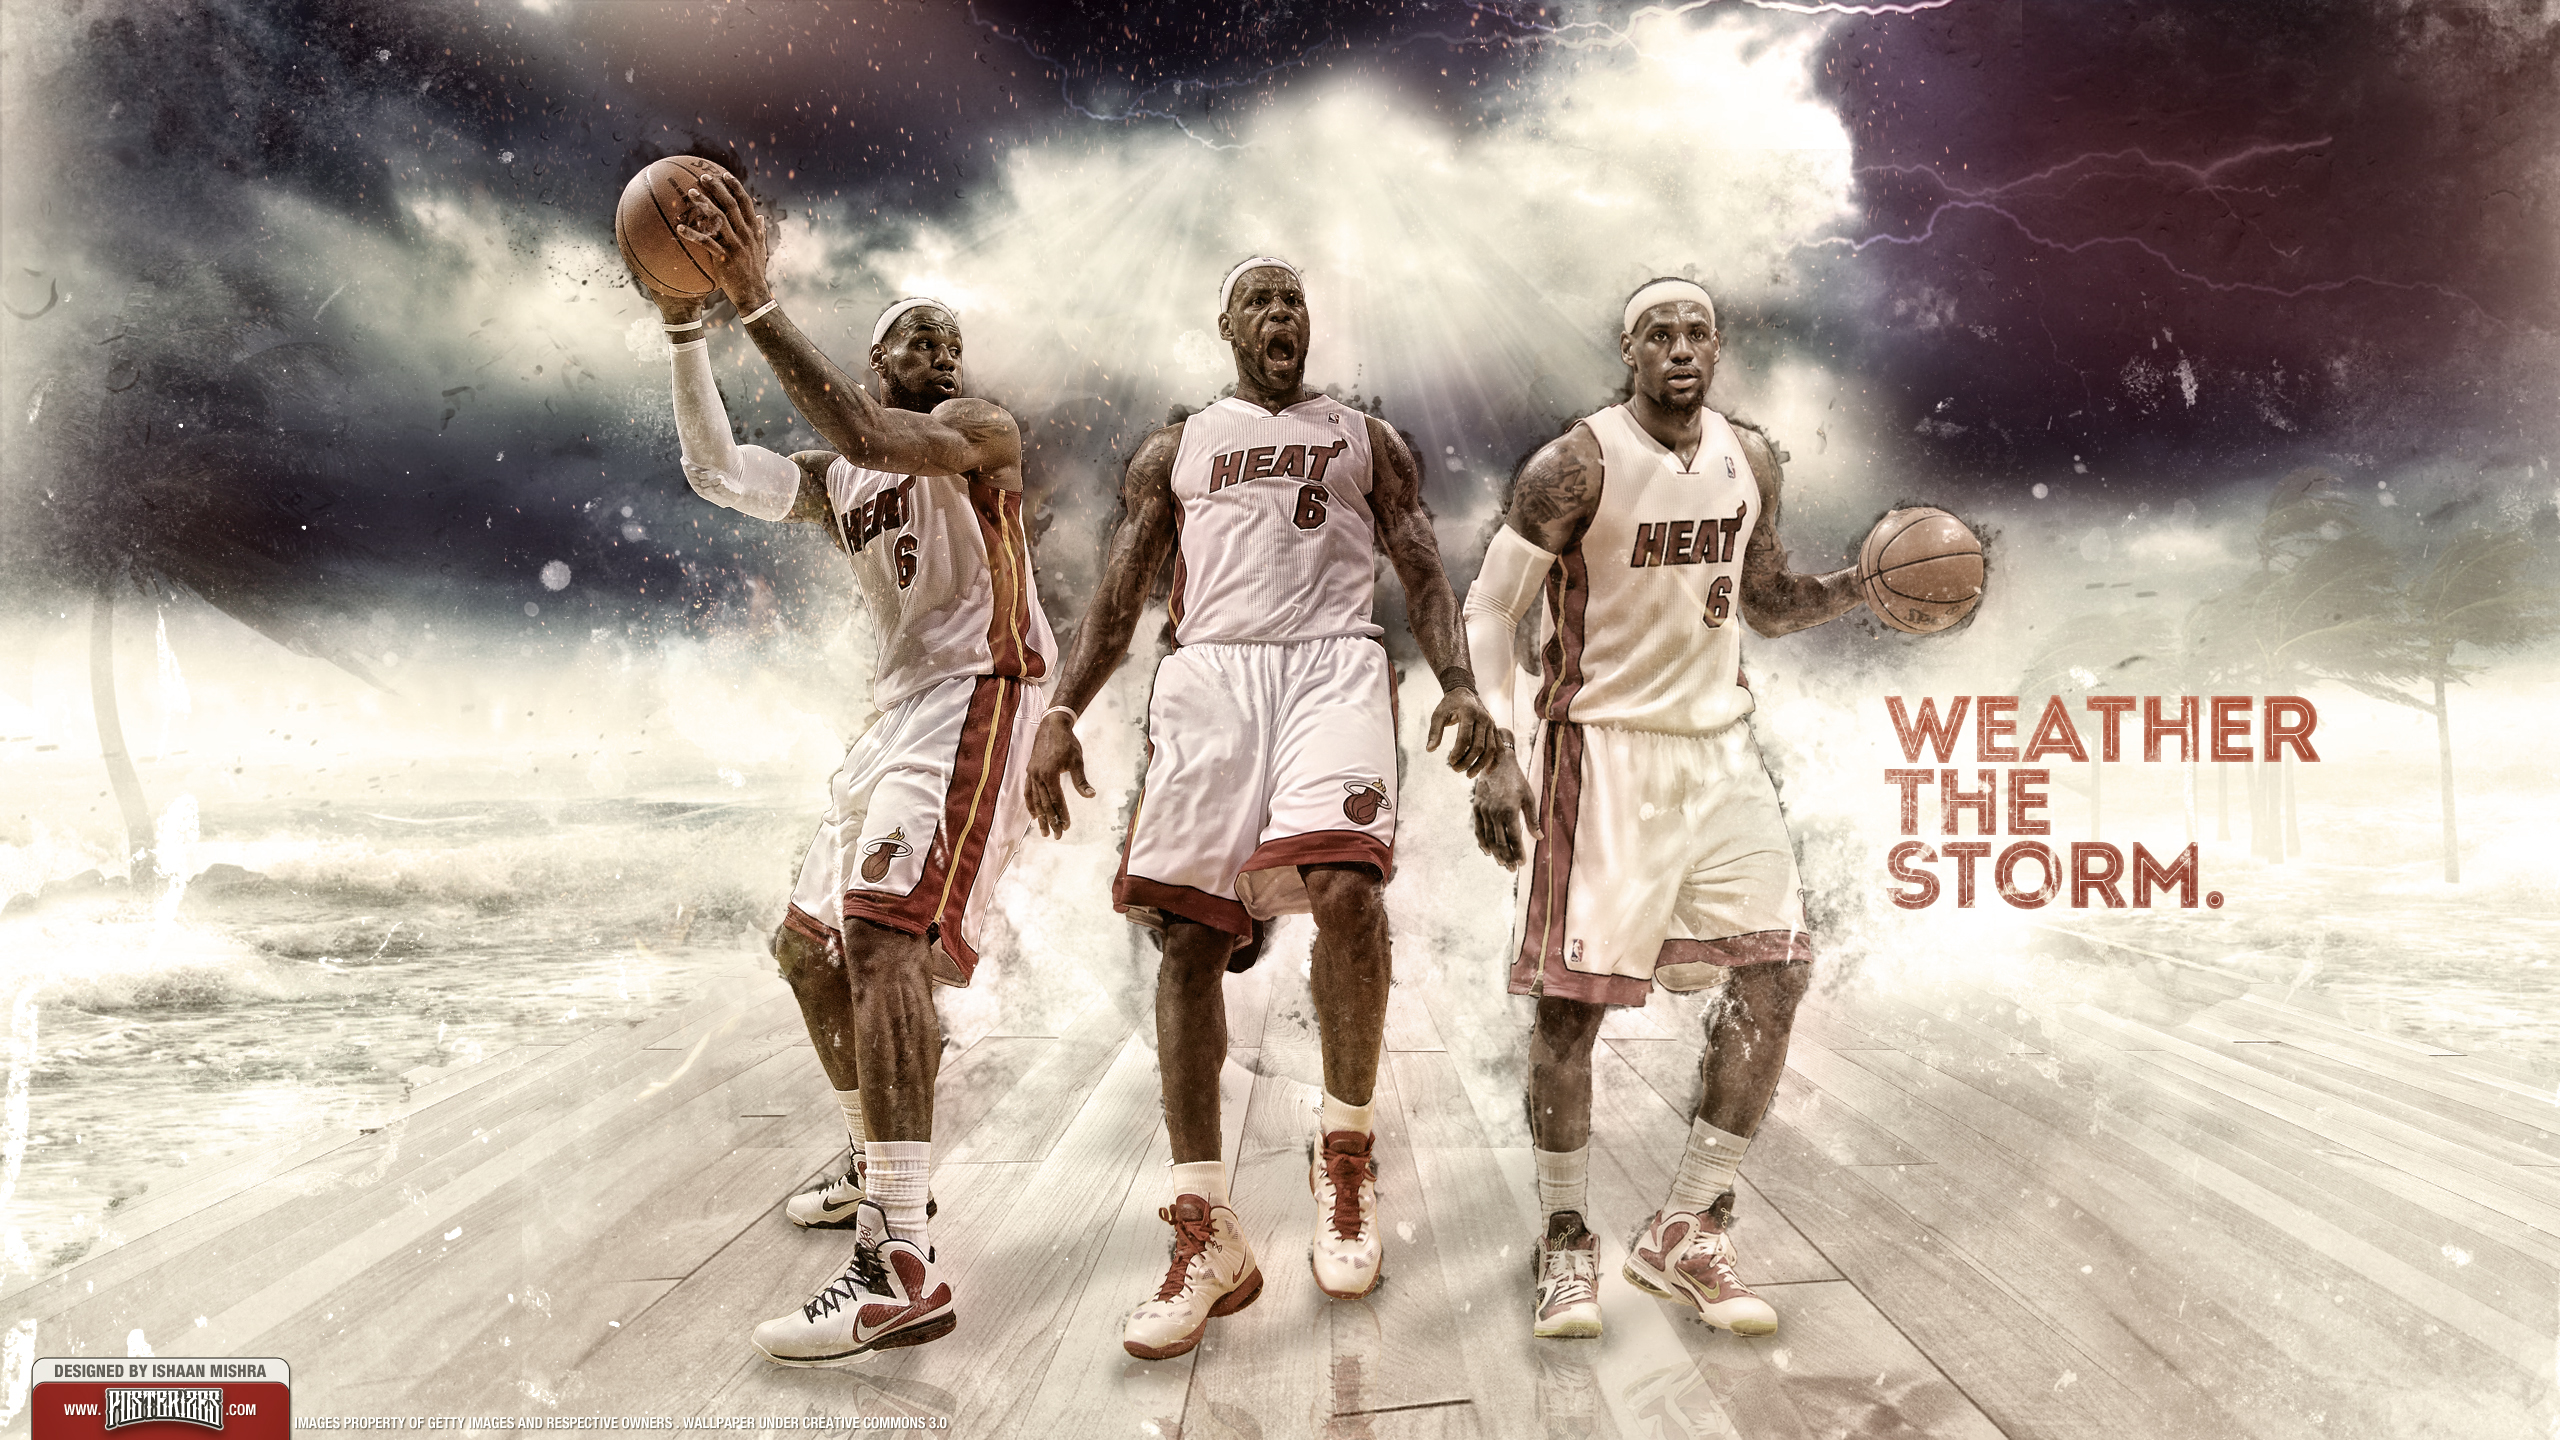 LeBron James 2012 Finals Wallpaper by IshaanMishra